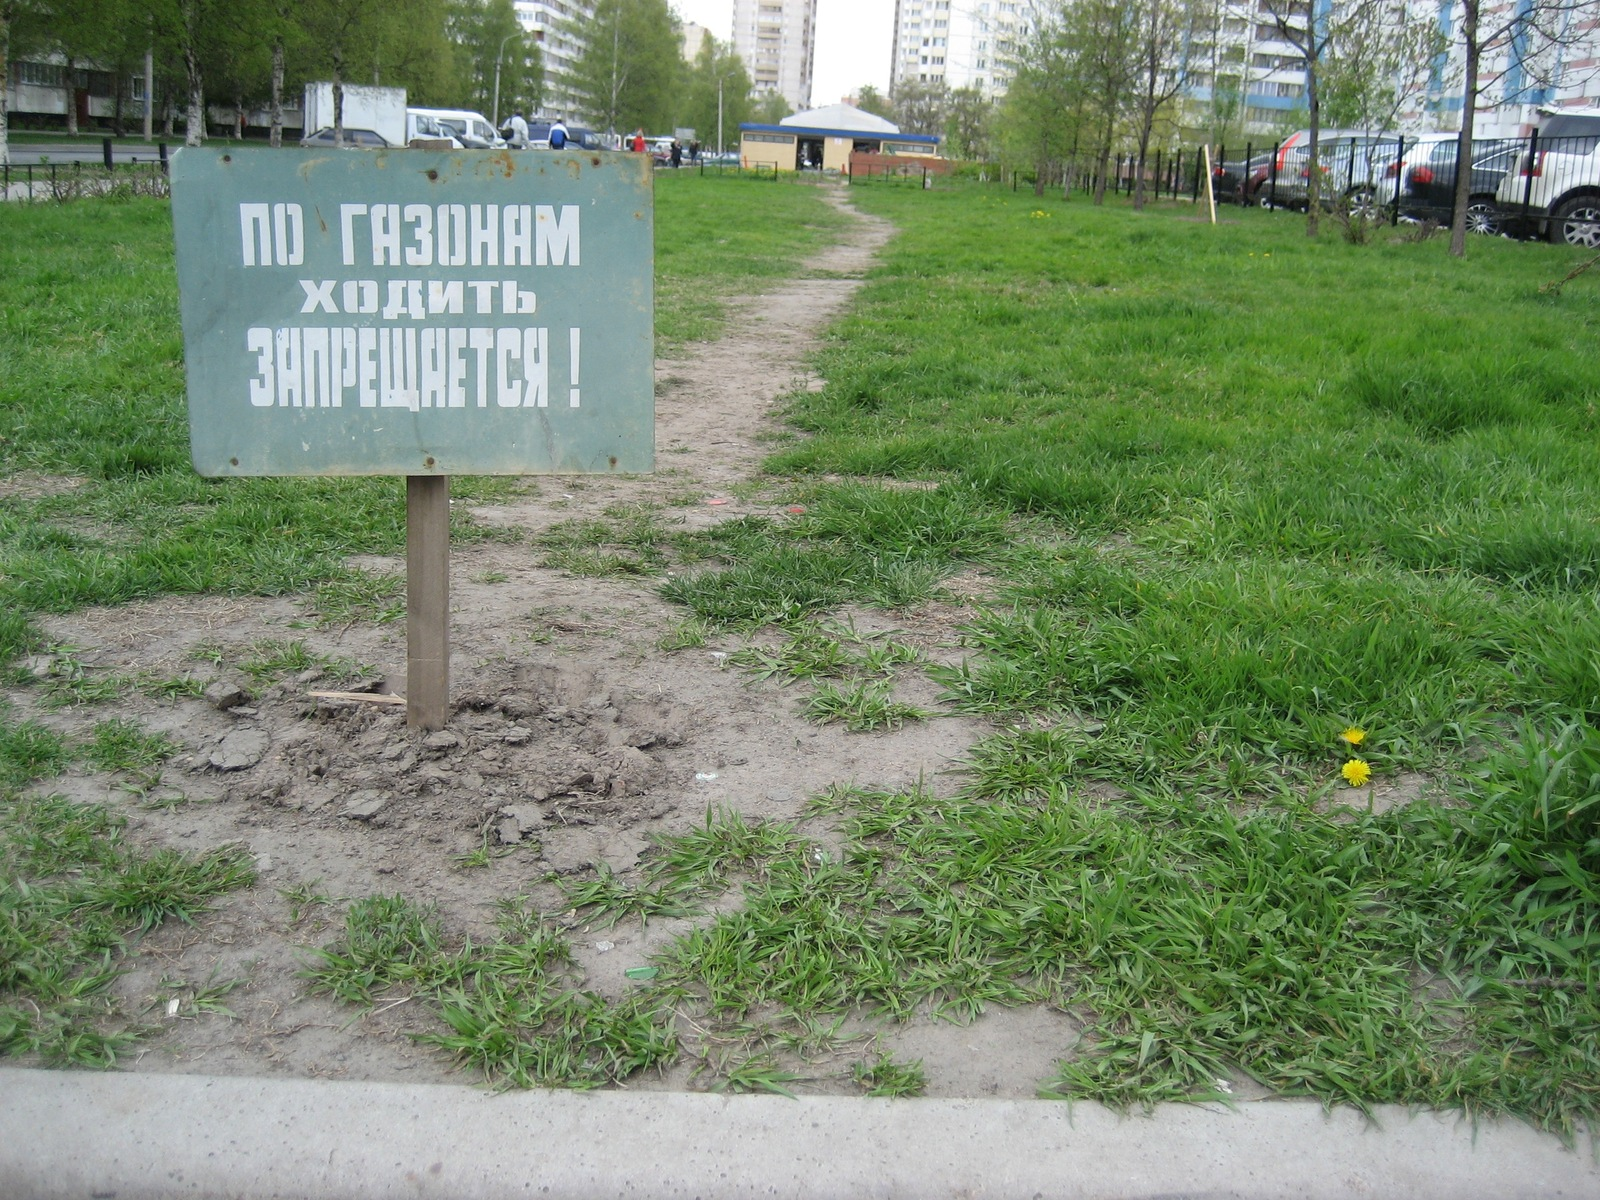 https://cs9.pikabu.ru/post_img/big/2016/11/10/8/1478781347121440178.jpg